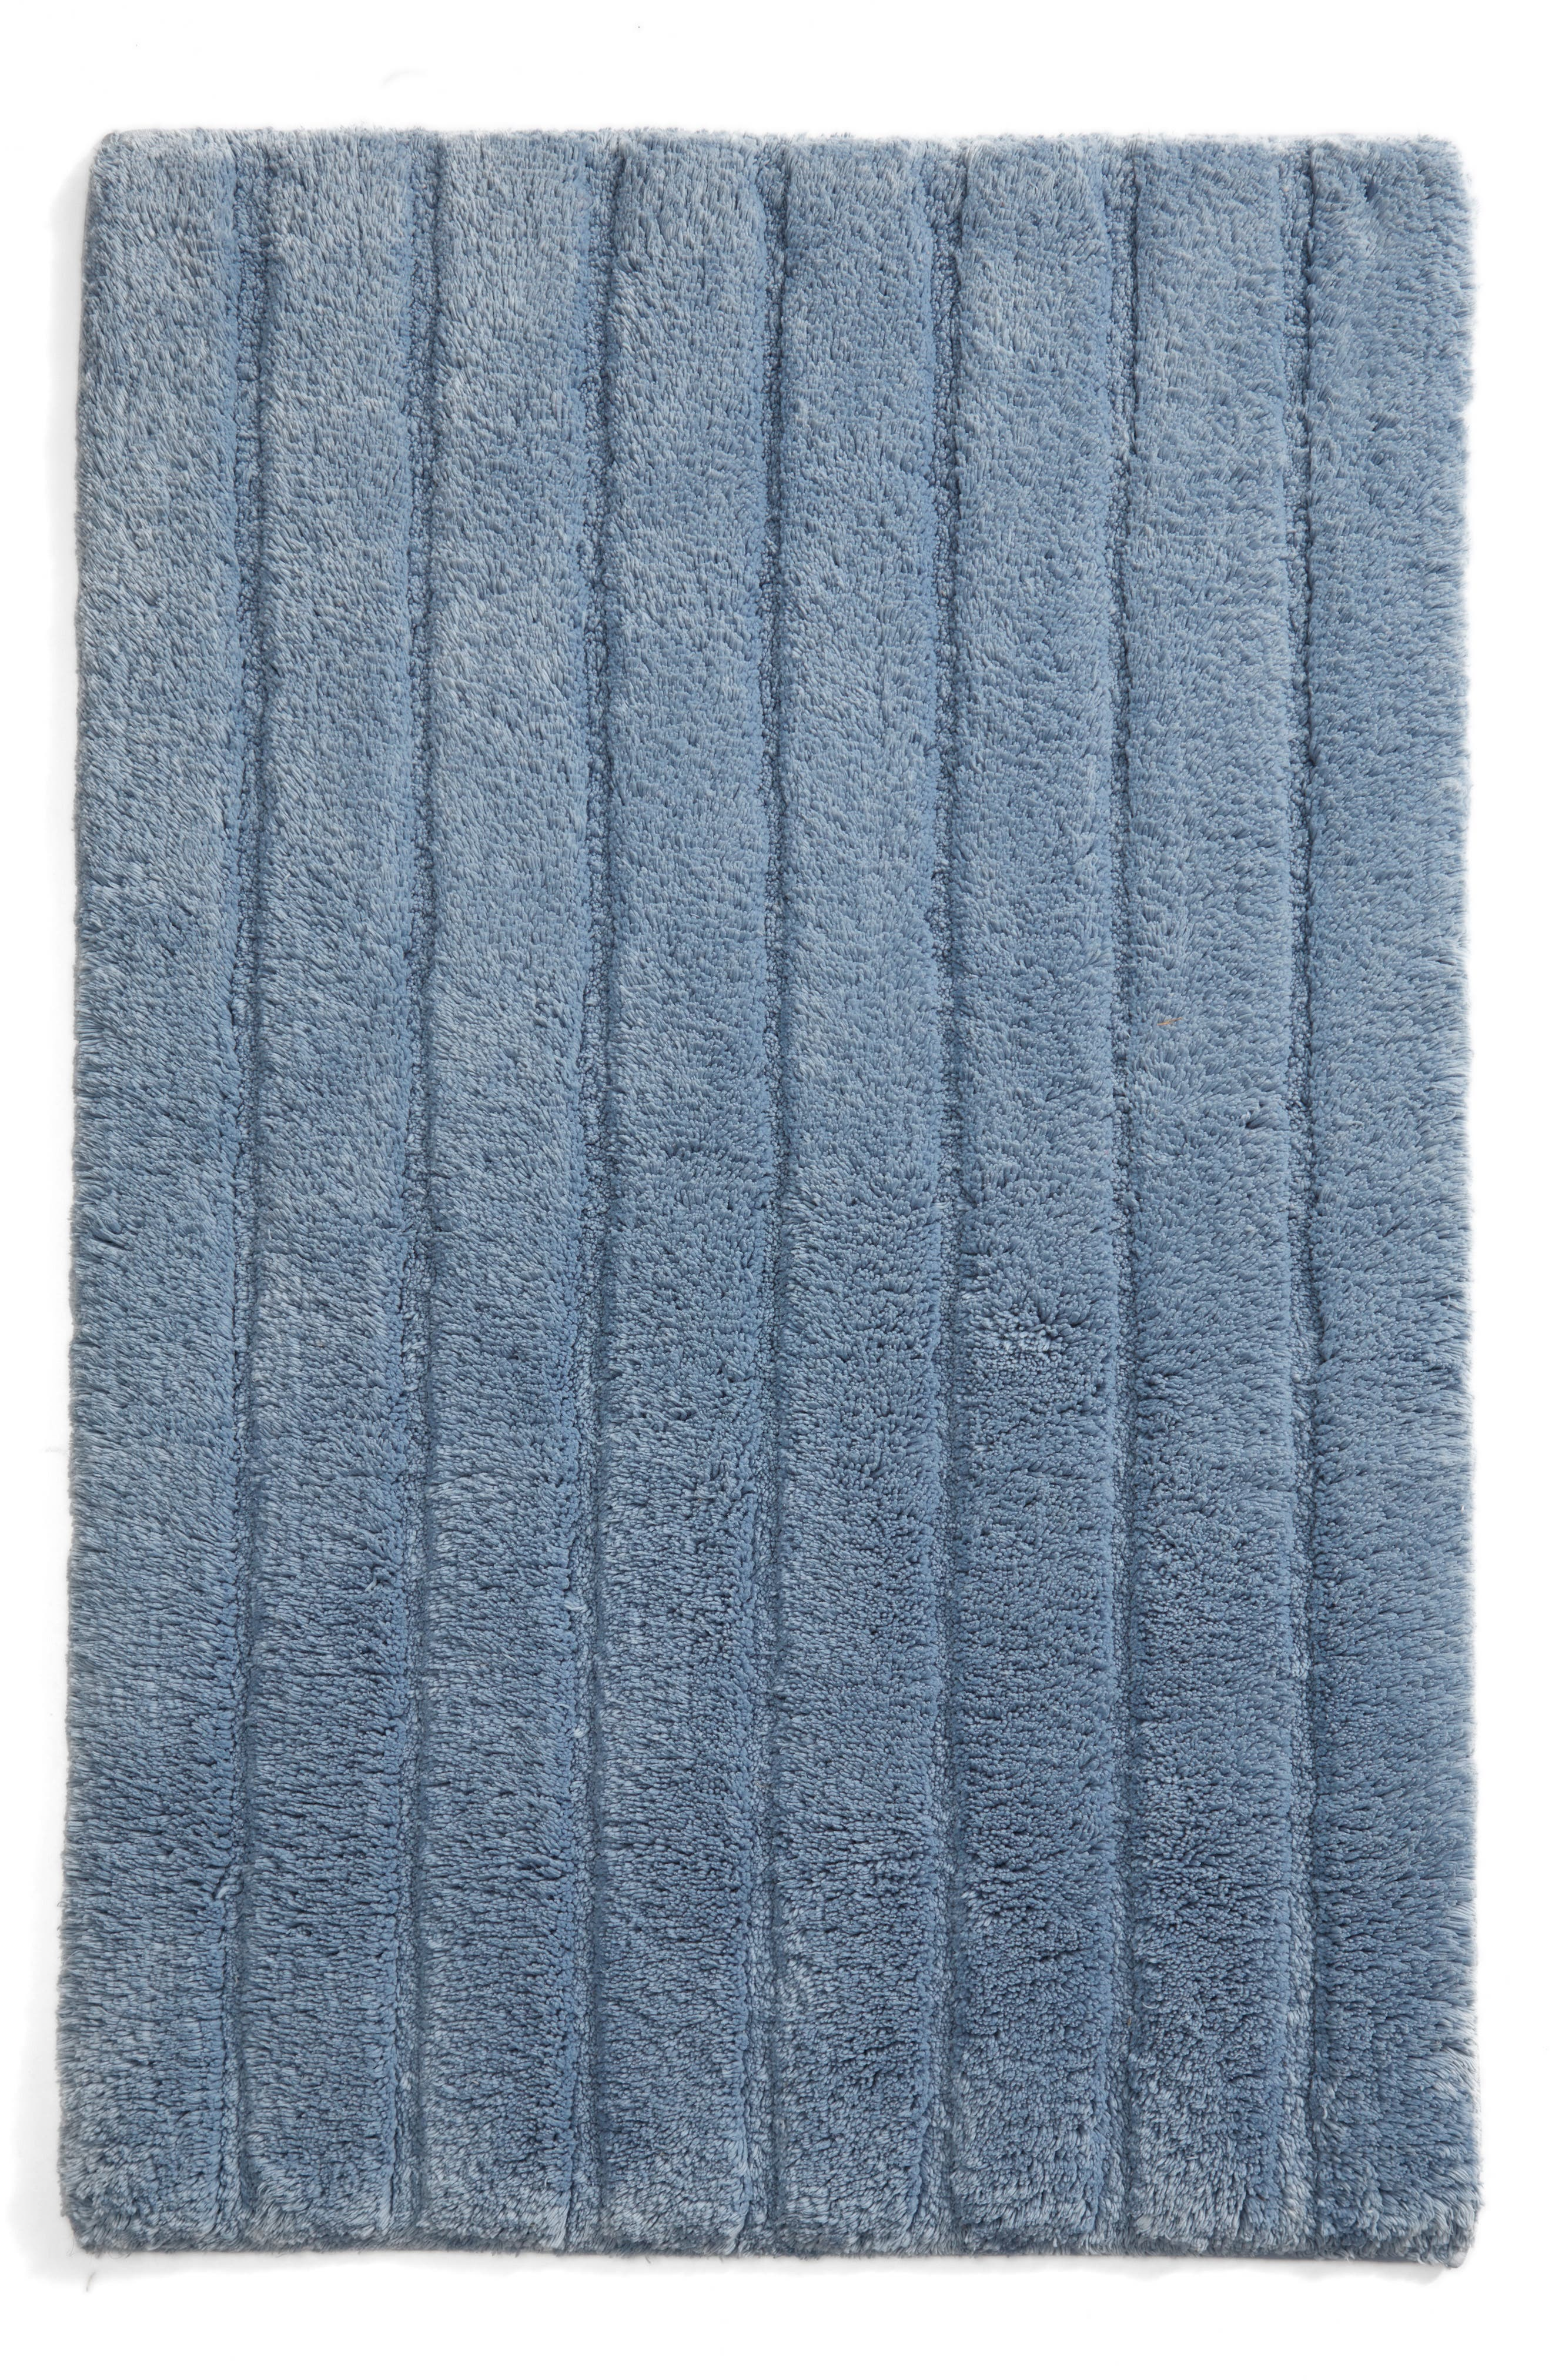 NORDSTROM AT HOME, Ribbed Velour Bath Rug, Main thumbnail 1, color, BLUE CHAMBRAY